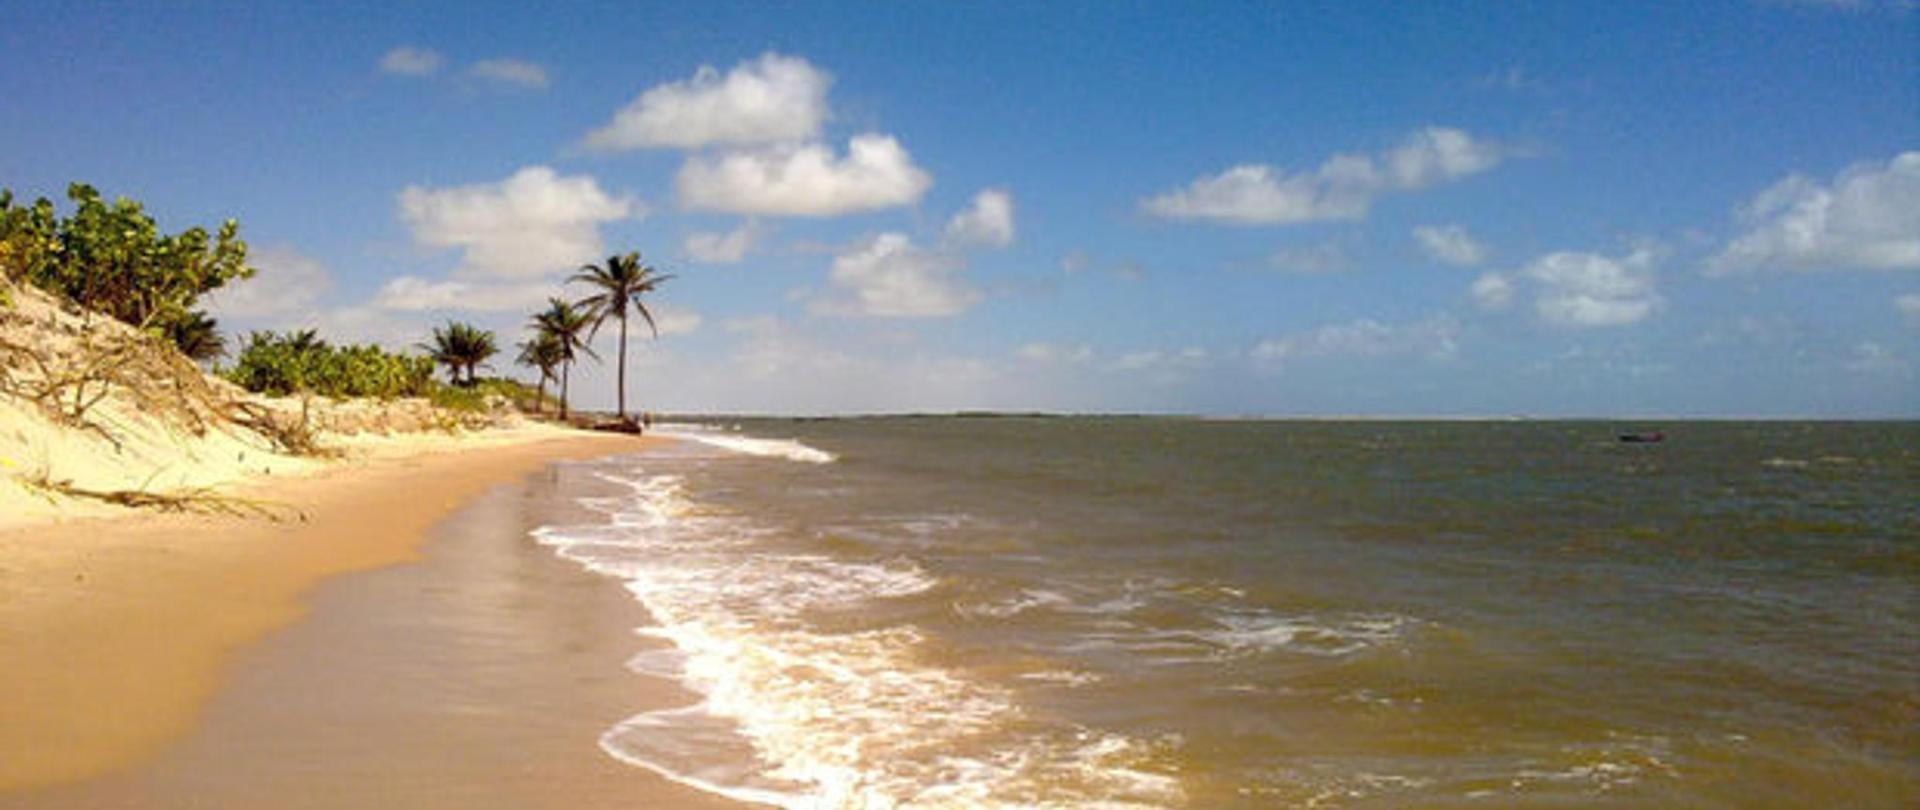 praia-de-atins.jpg